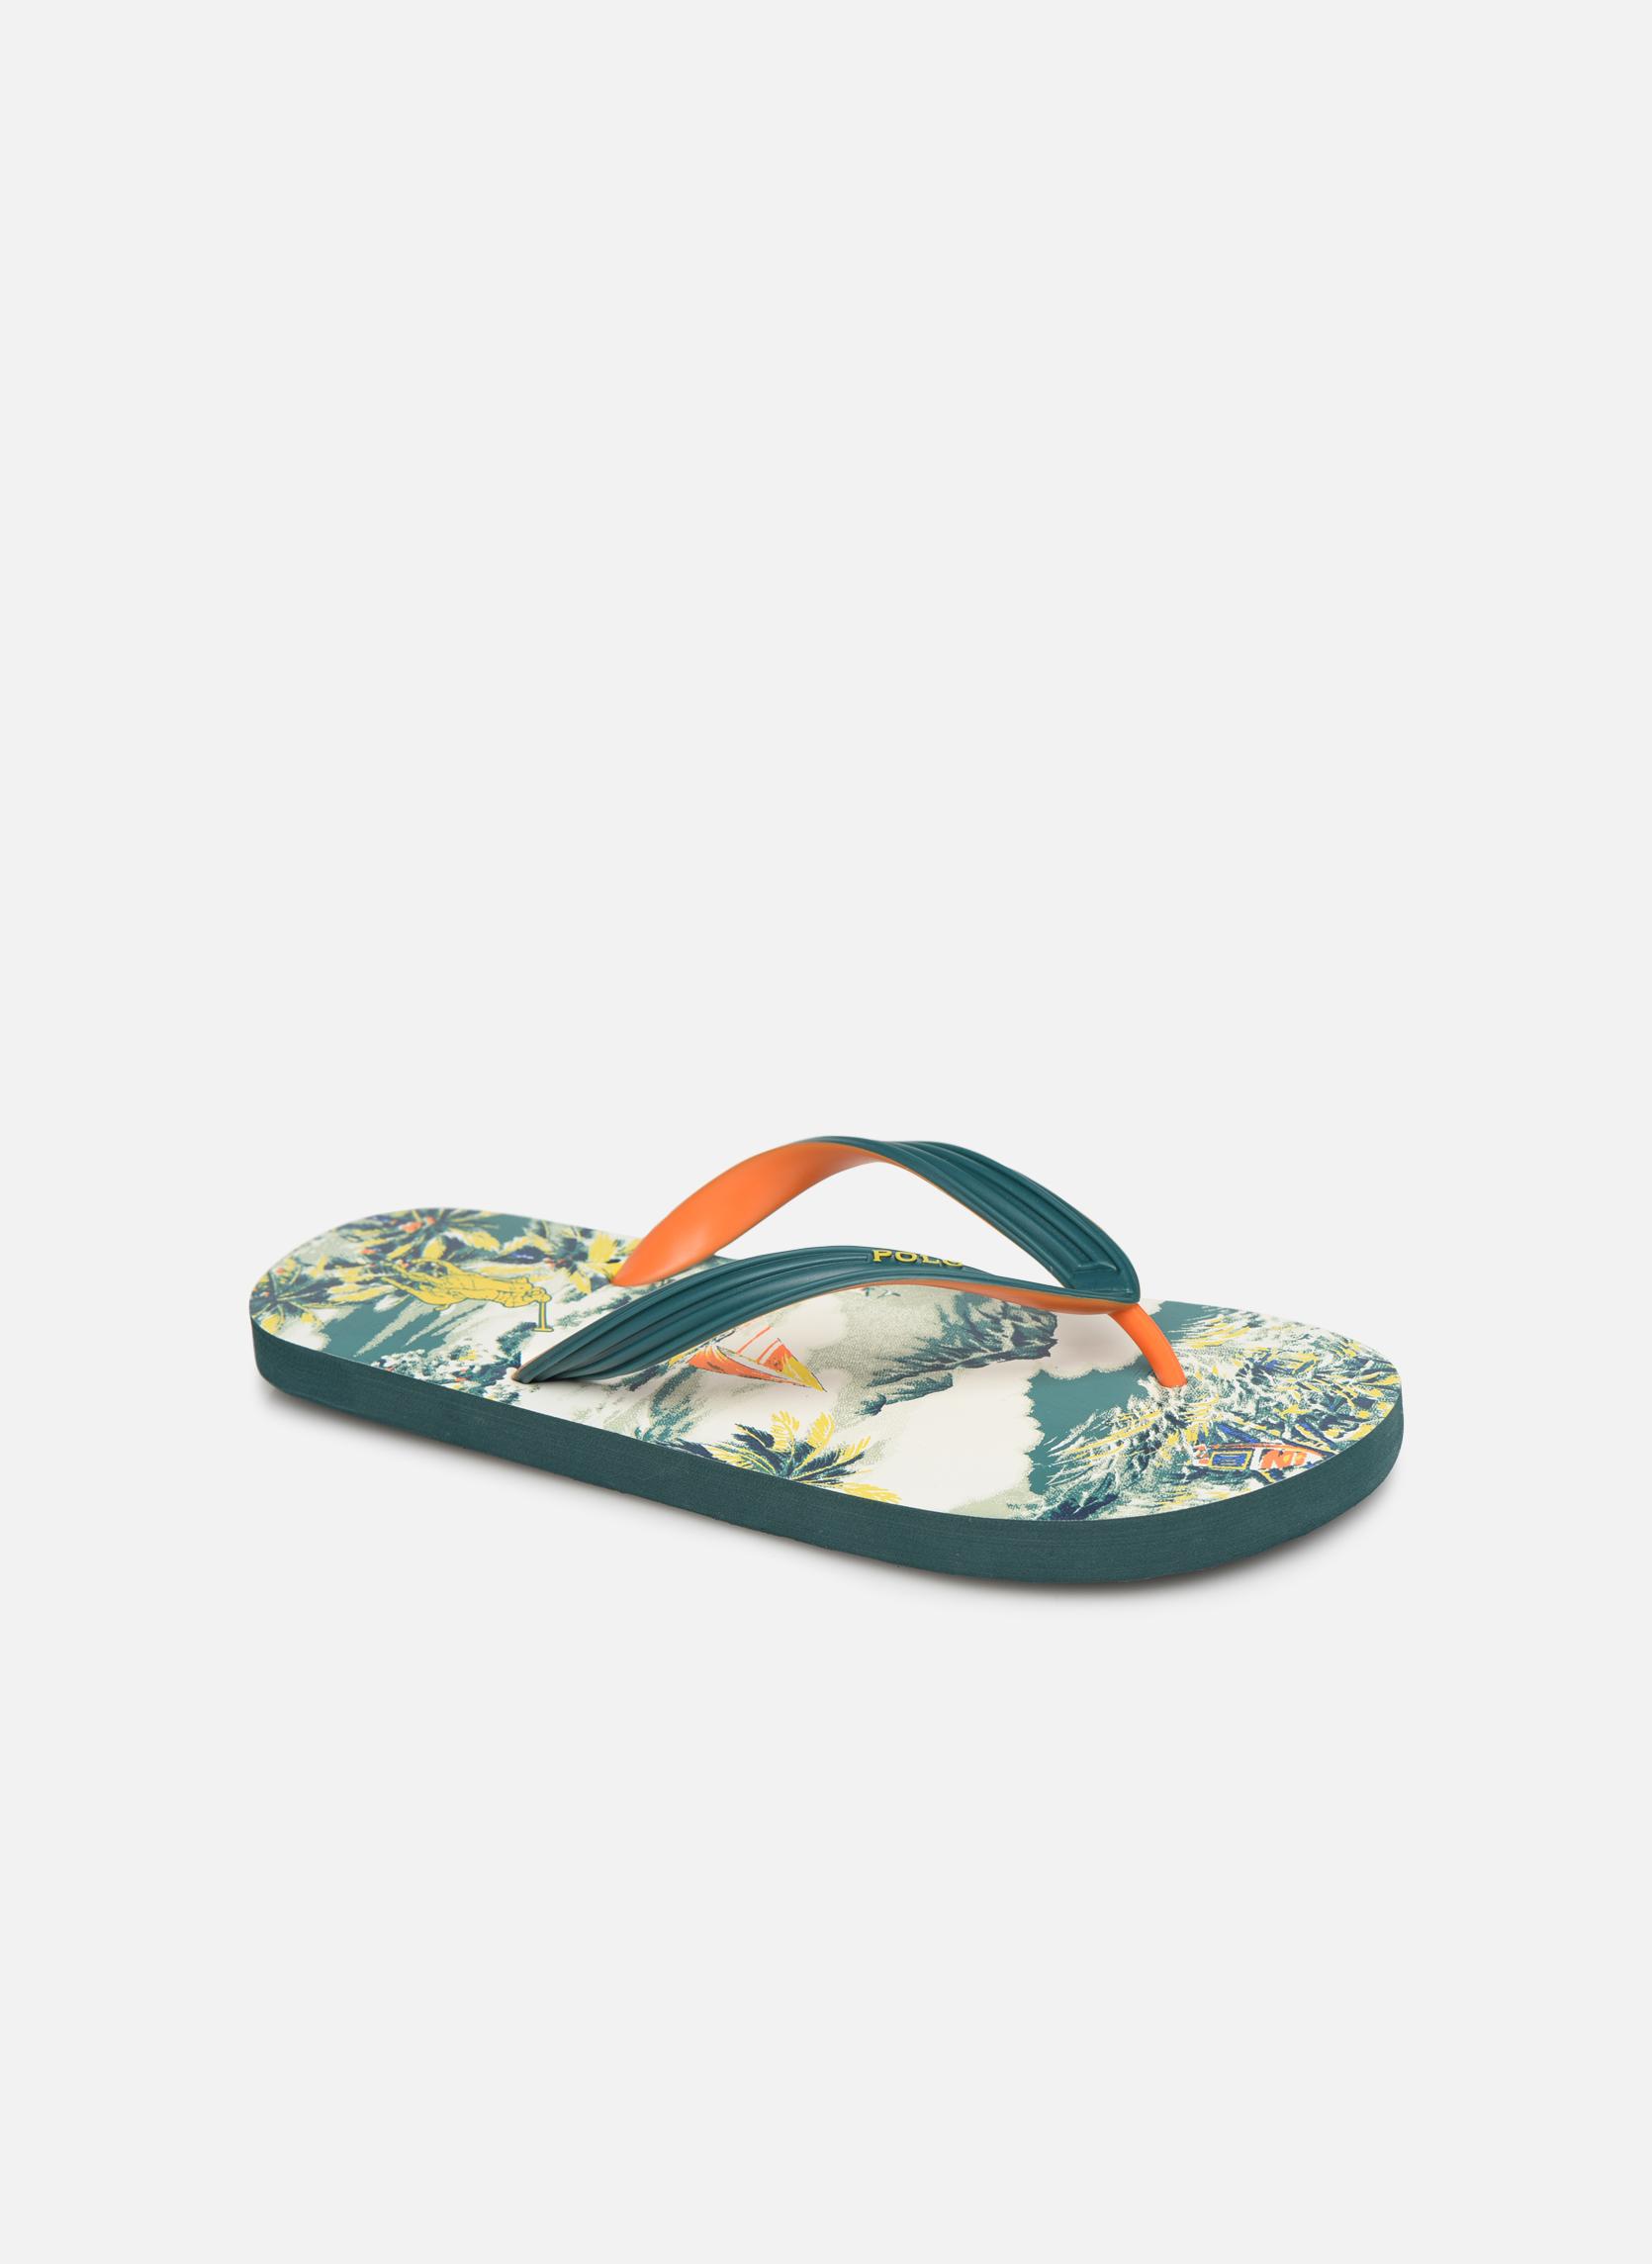 Slippers Polo Ralph Lauren Multicolor